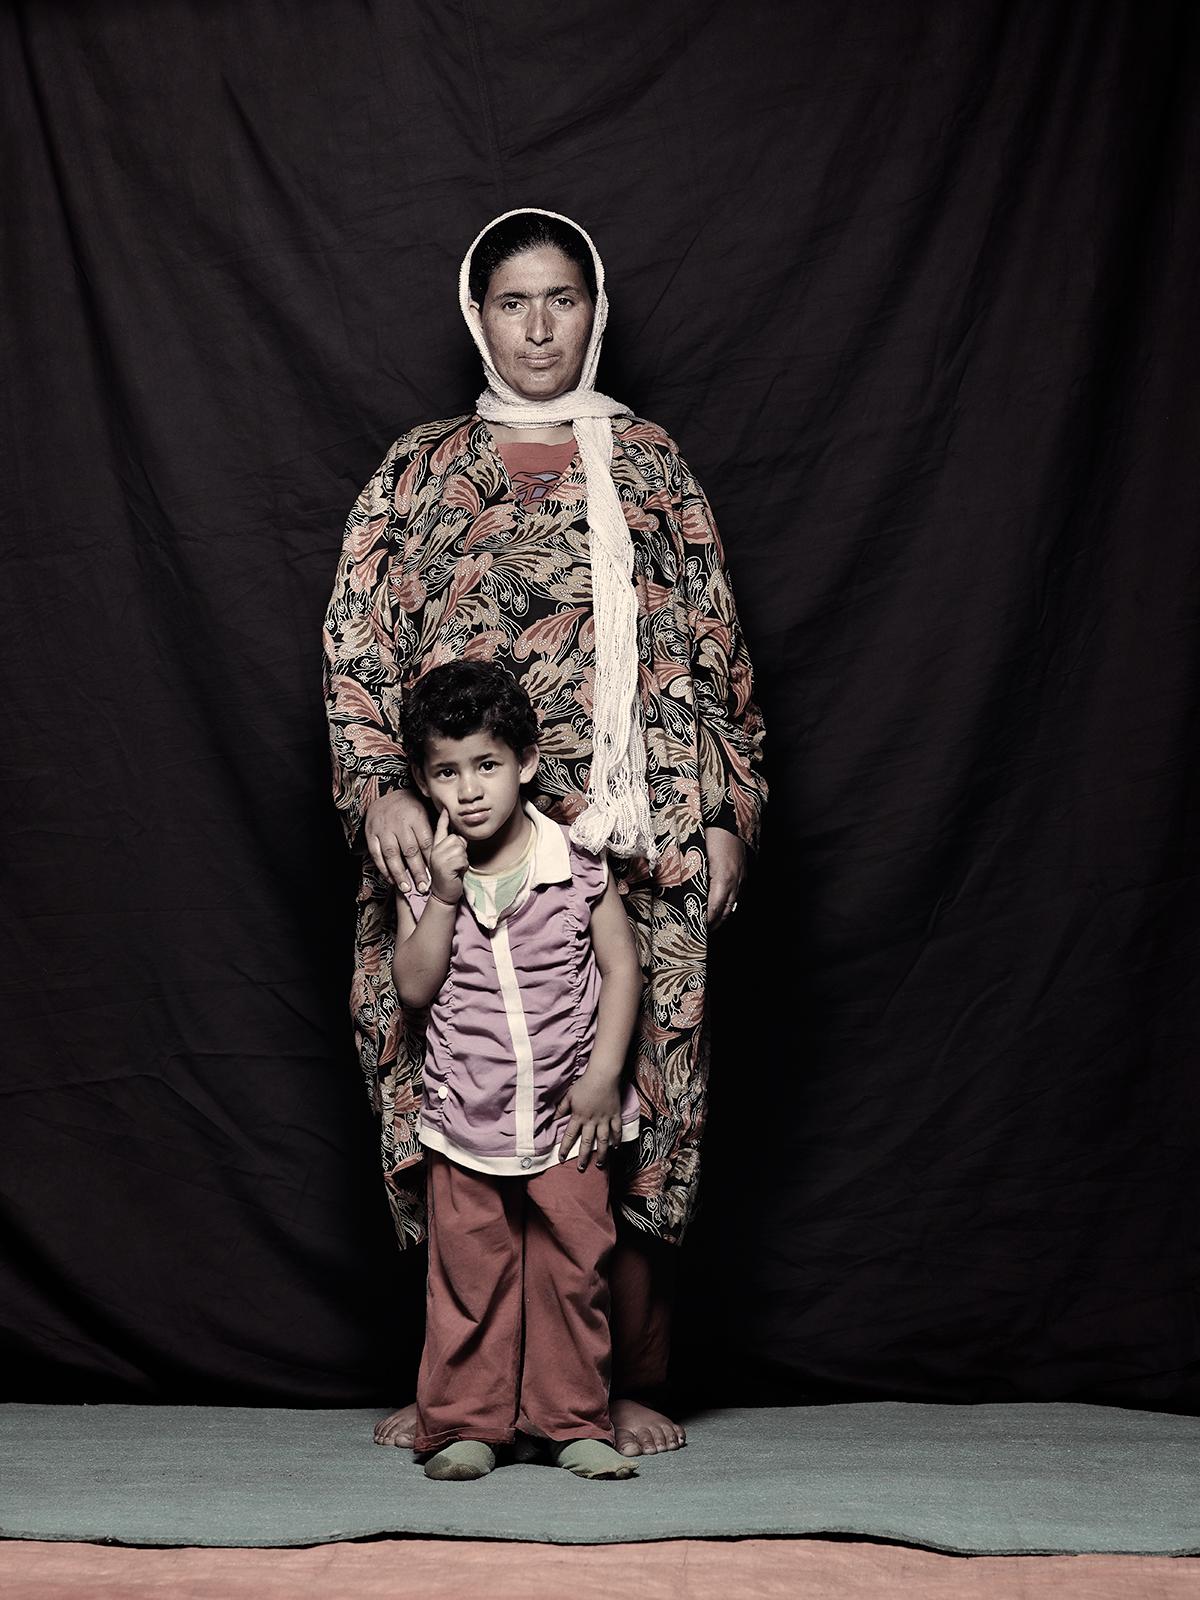 Shaheen Bilal, 27 and Surya Bilal, 4, D-camp, 2013